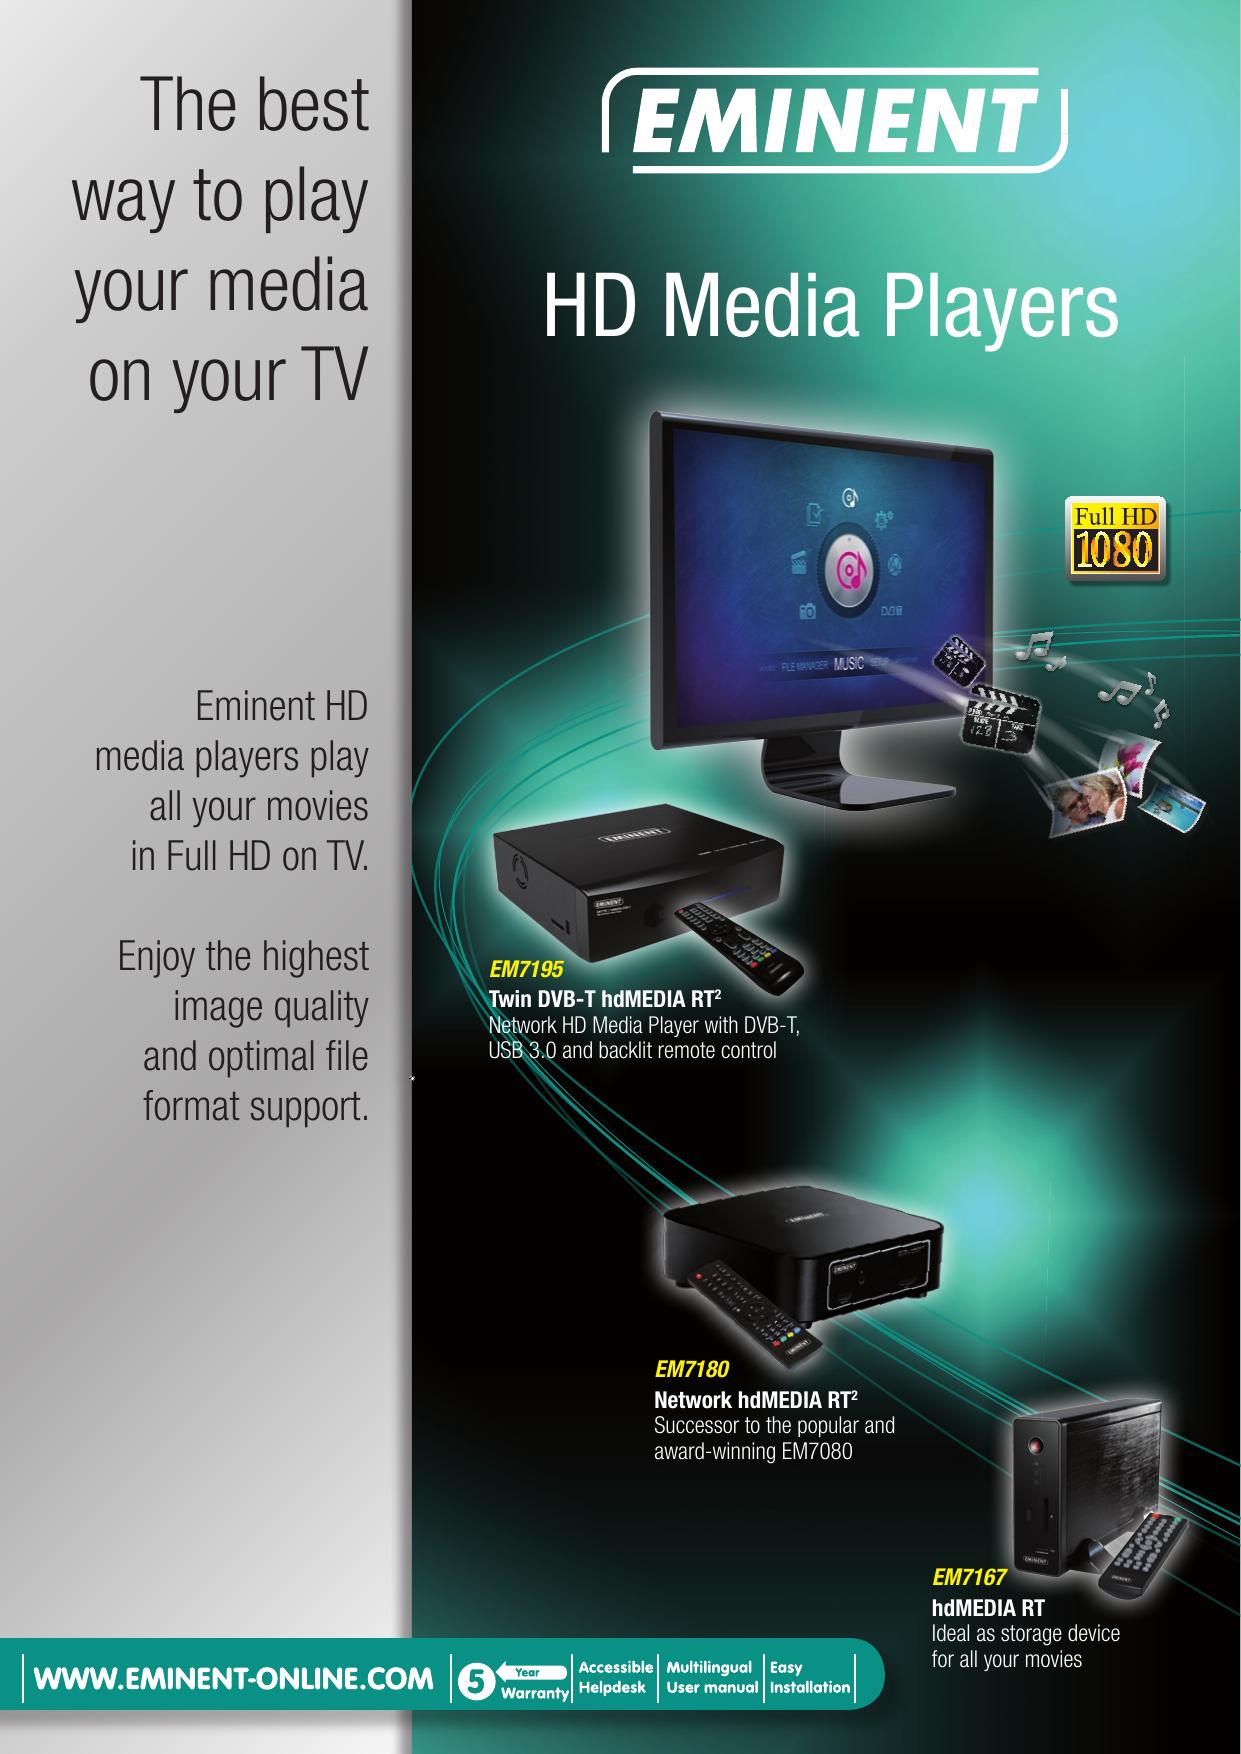 HD Media Players